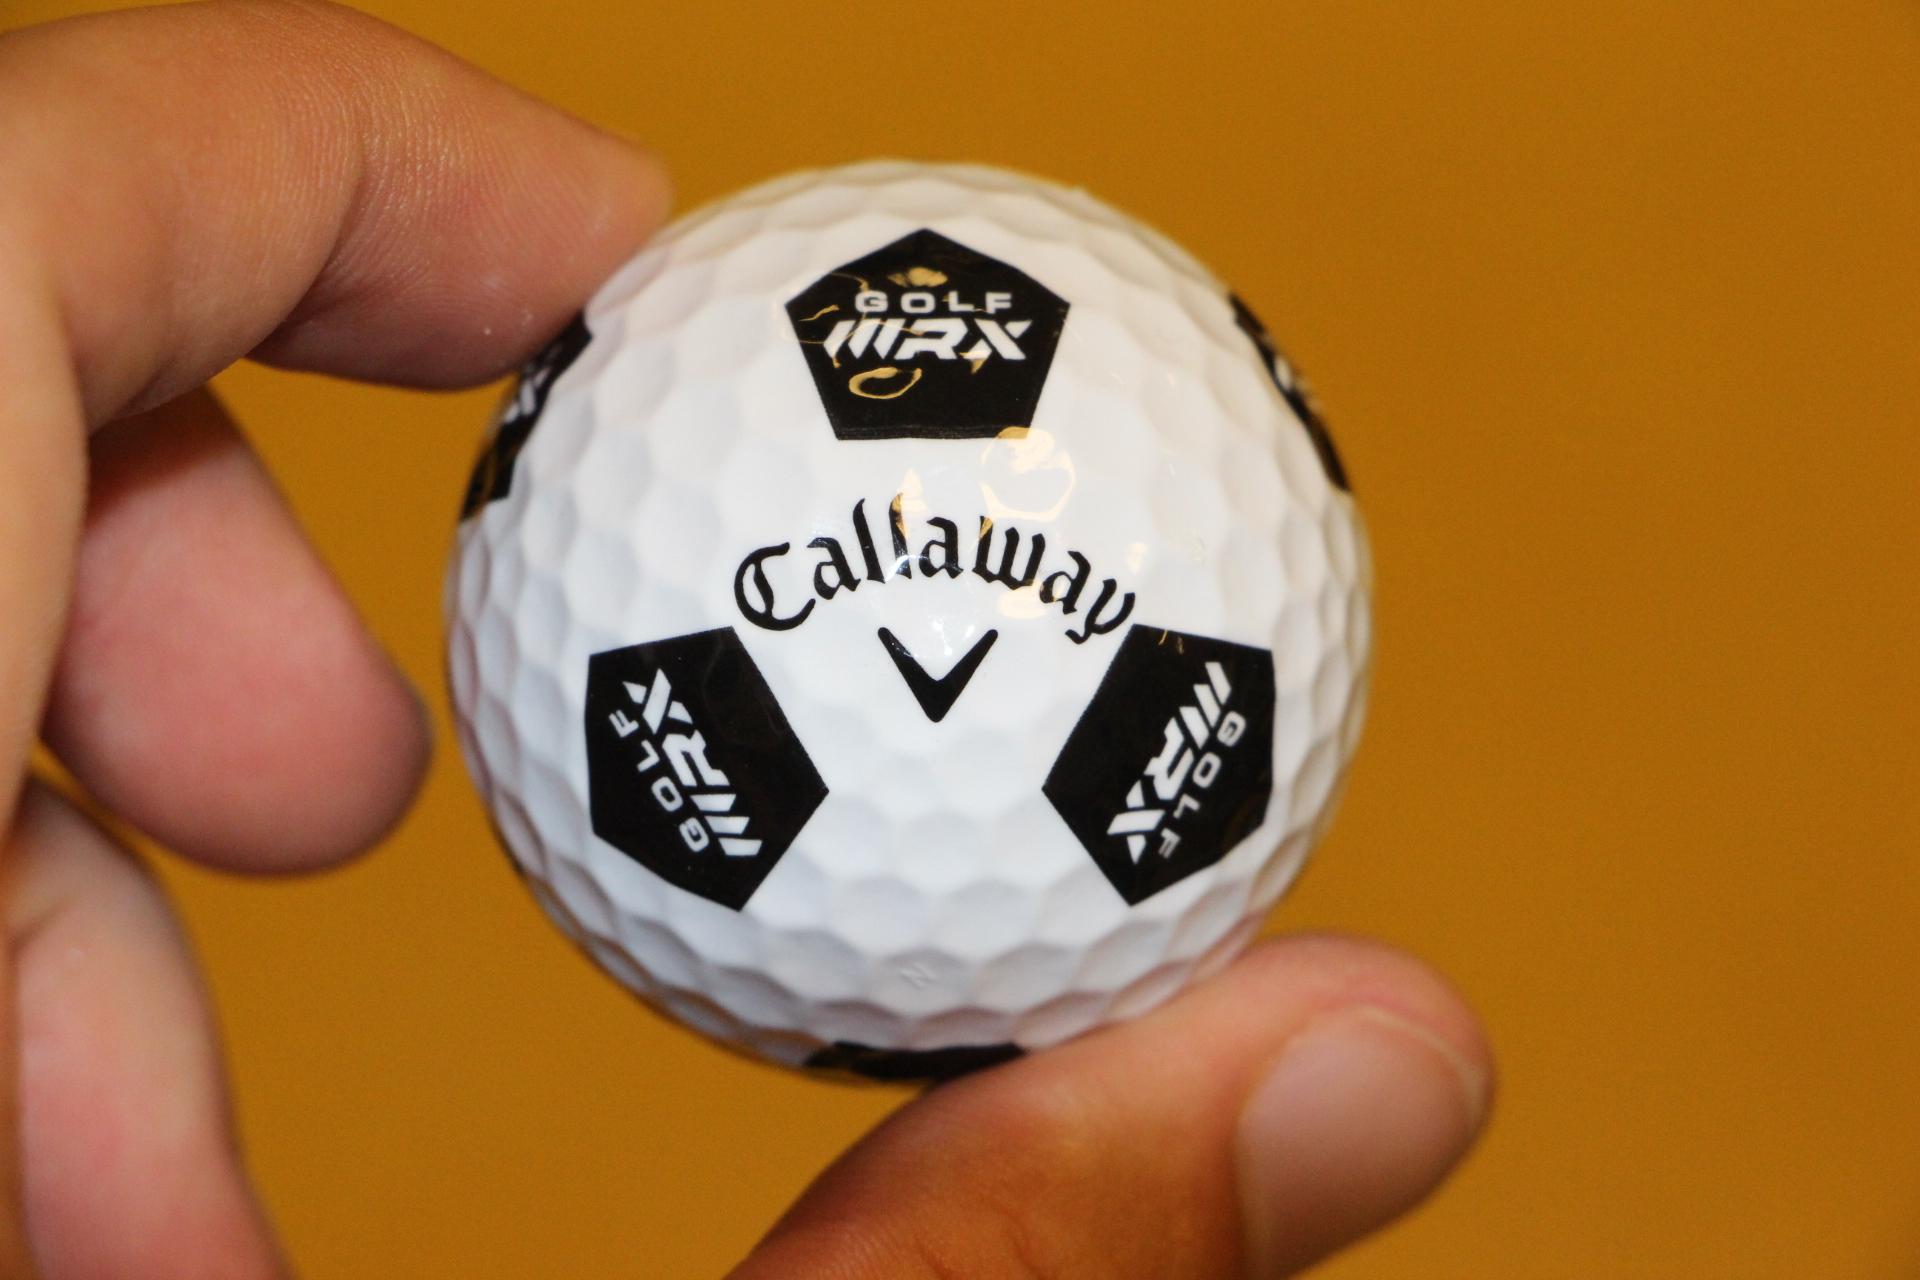 GolfWRXTruvisCallaway